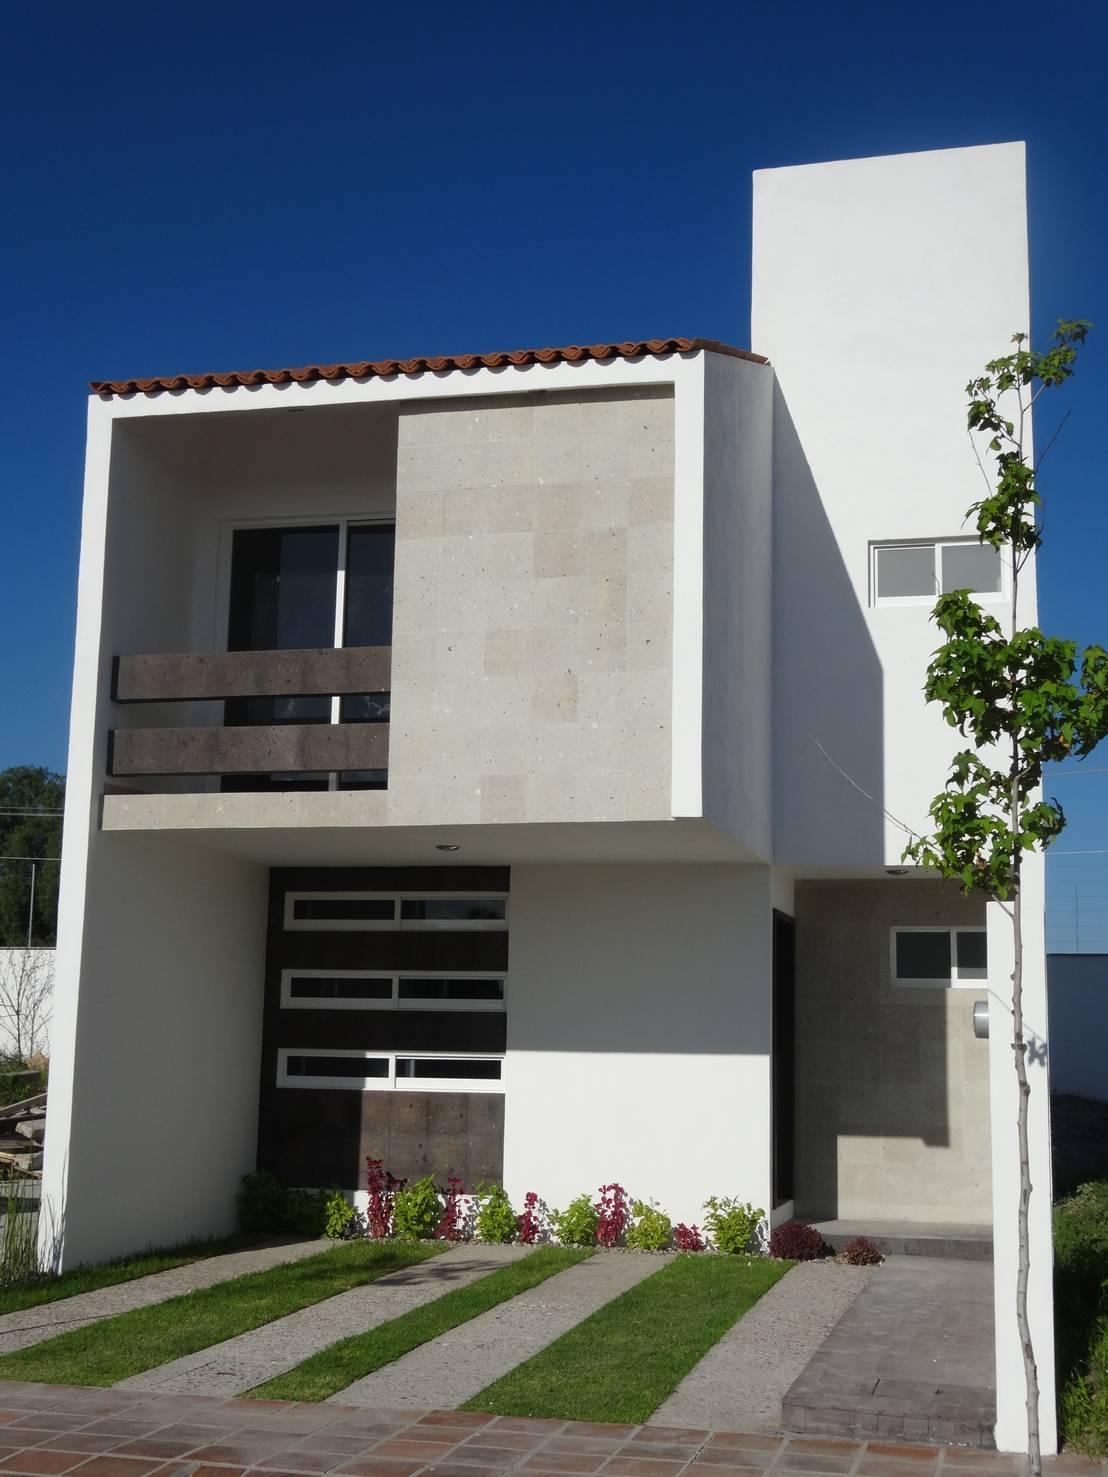 Casa ped de constructora arqoce homify for Homify casas